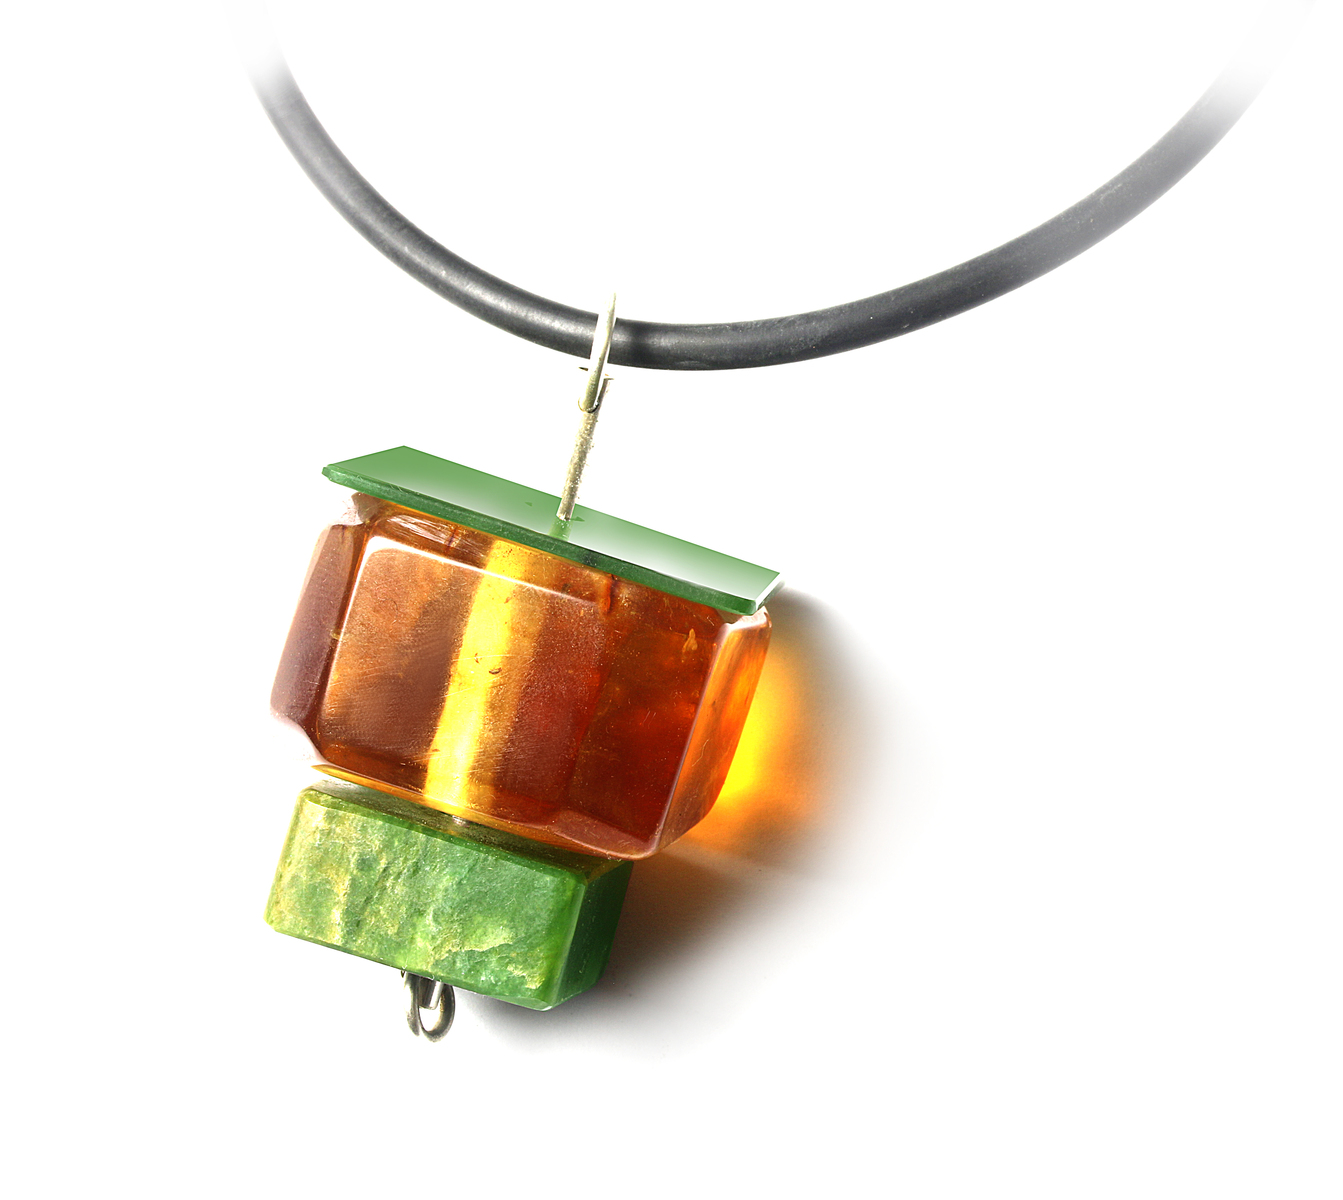 NA125- Pounamu, Kauri Gum and sterling silver pendant on rubber